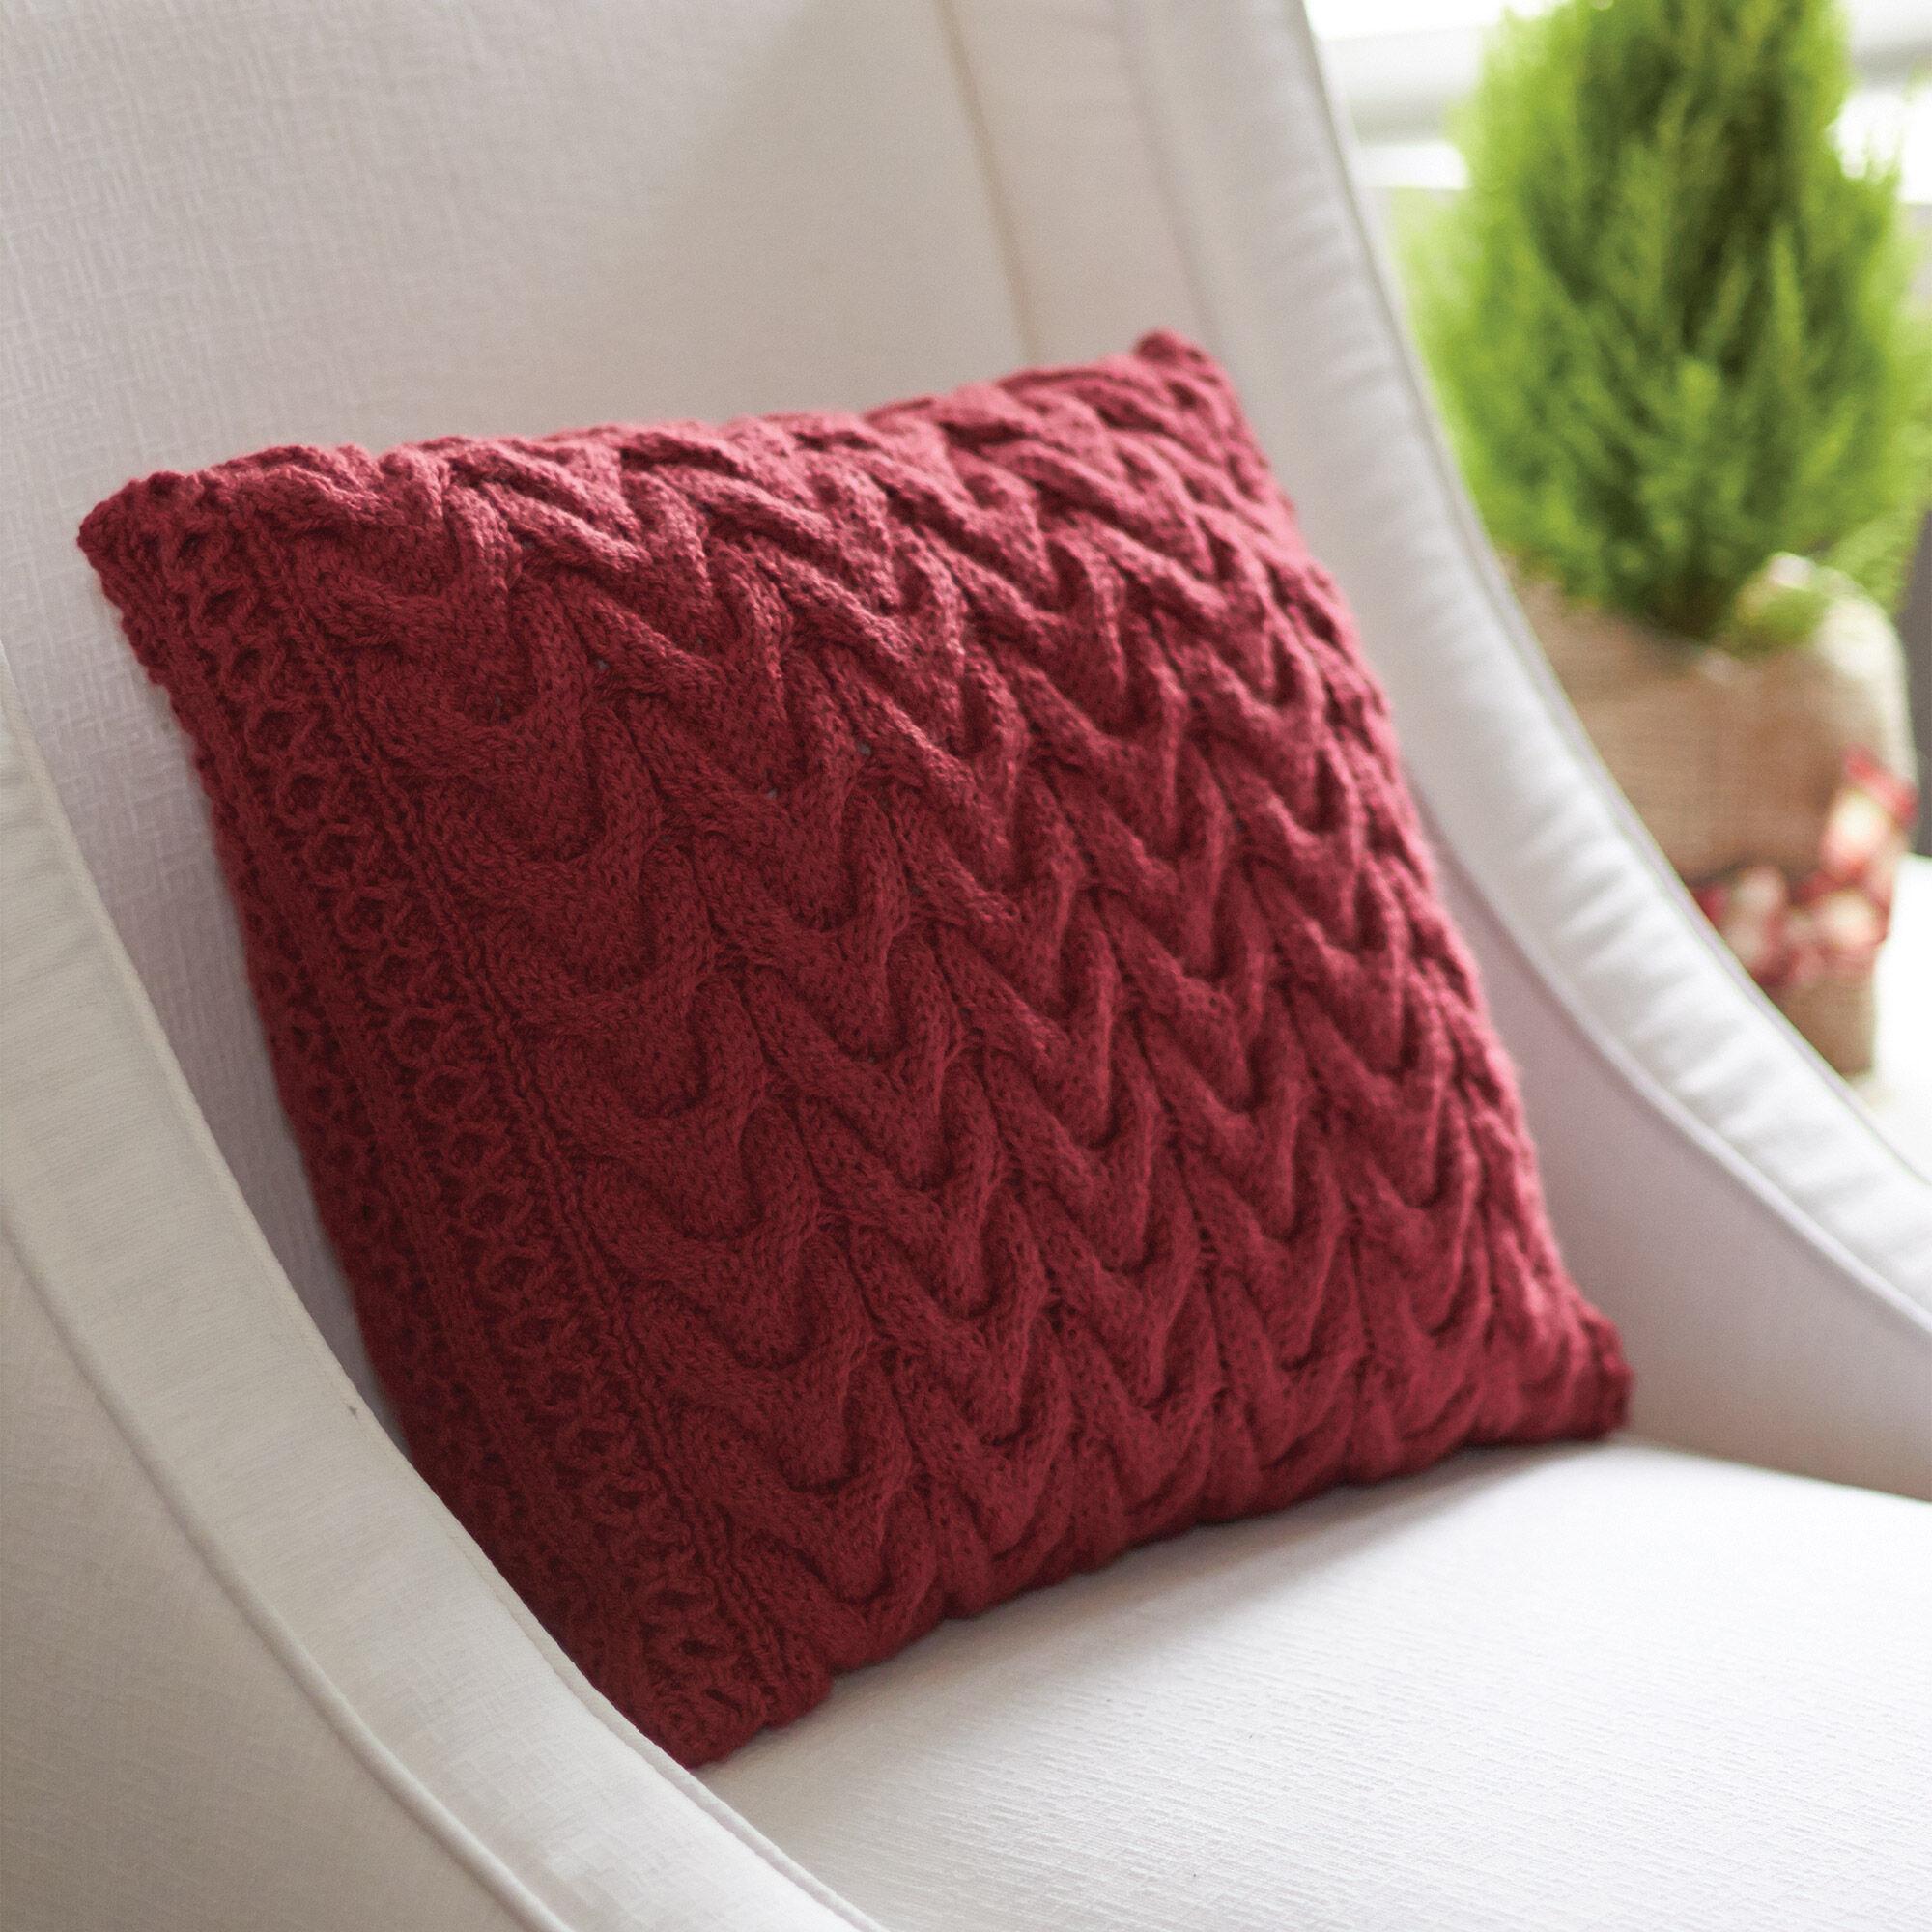 Patons Christmas Cables Pillow | Yarnspirations